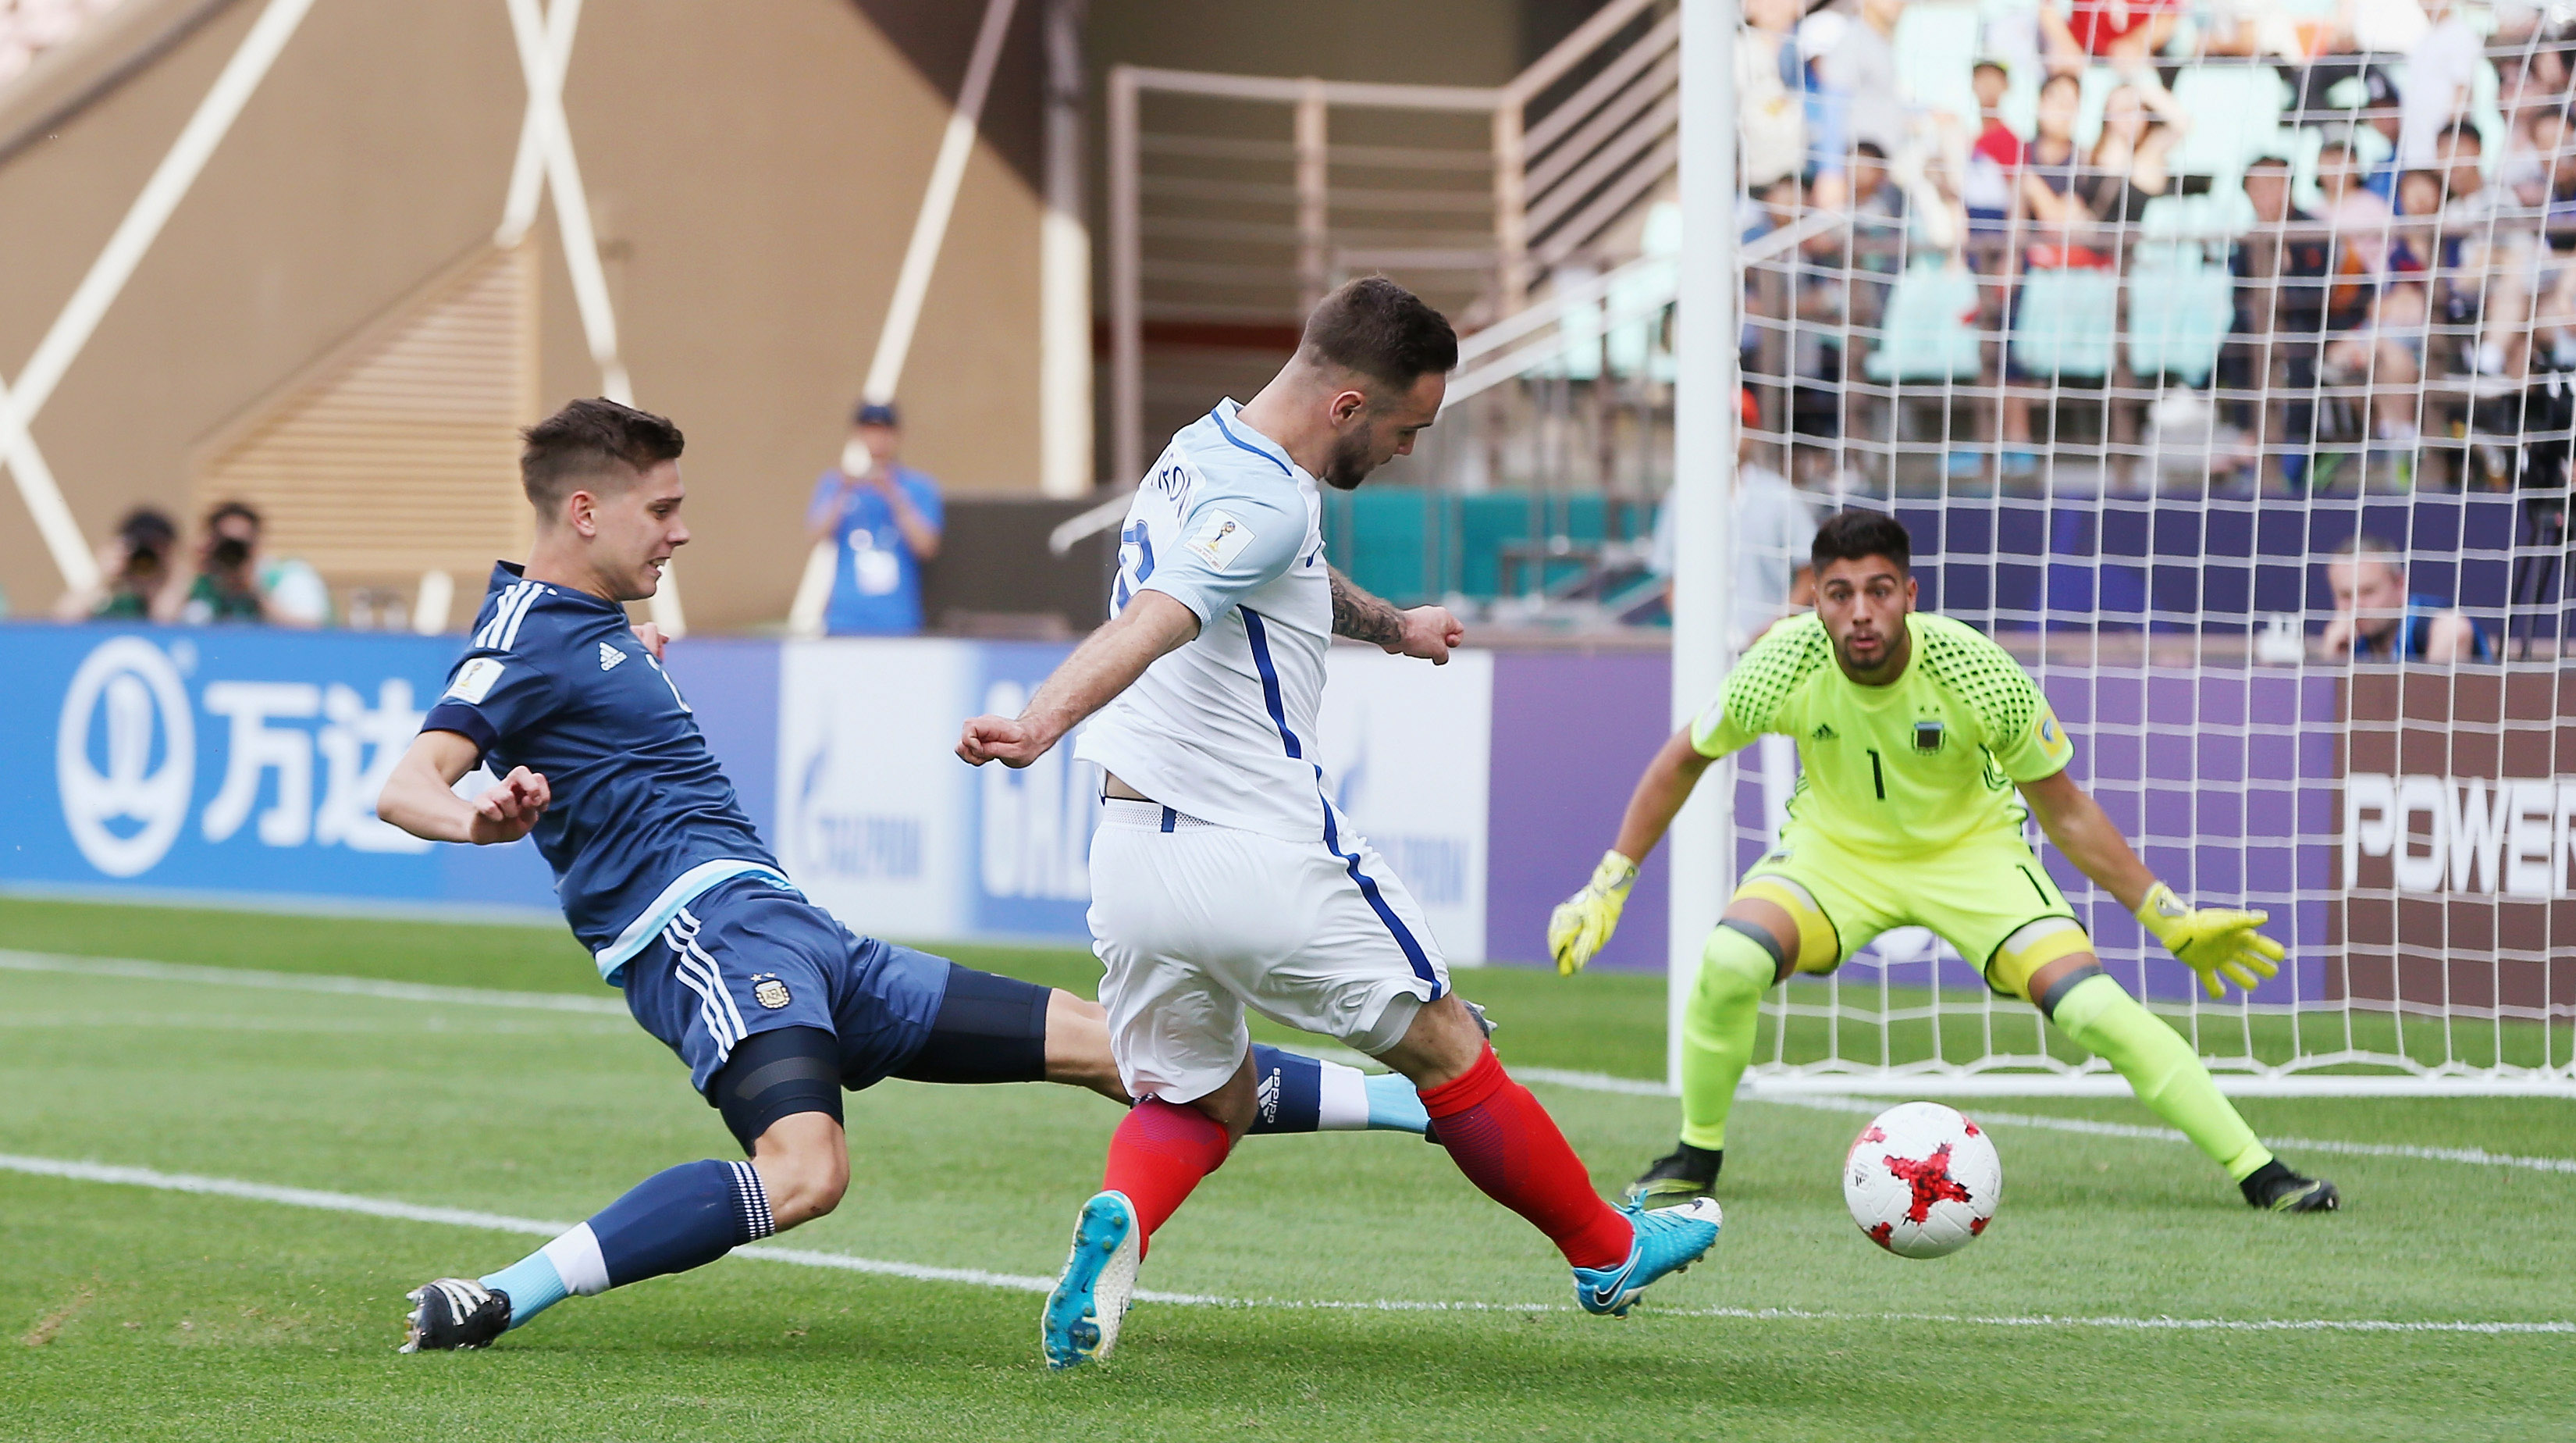 685705152-argentina-v-england-fifa-u-20-world-cup-korea-republic-2017.jpg